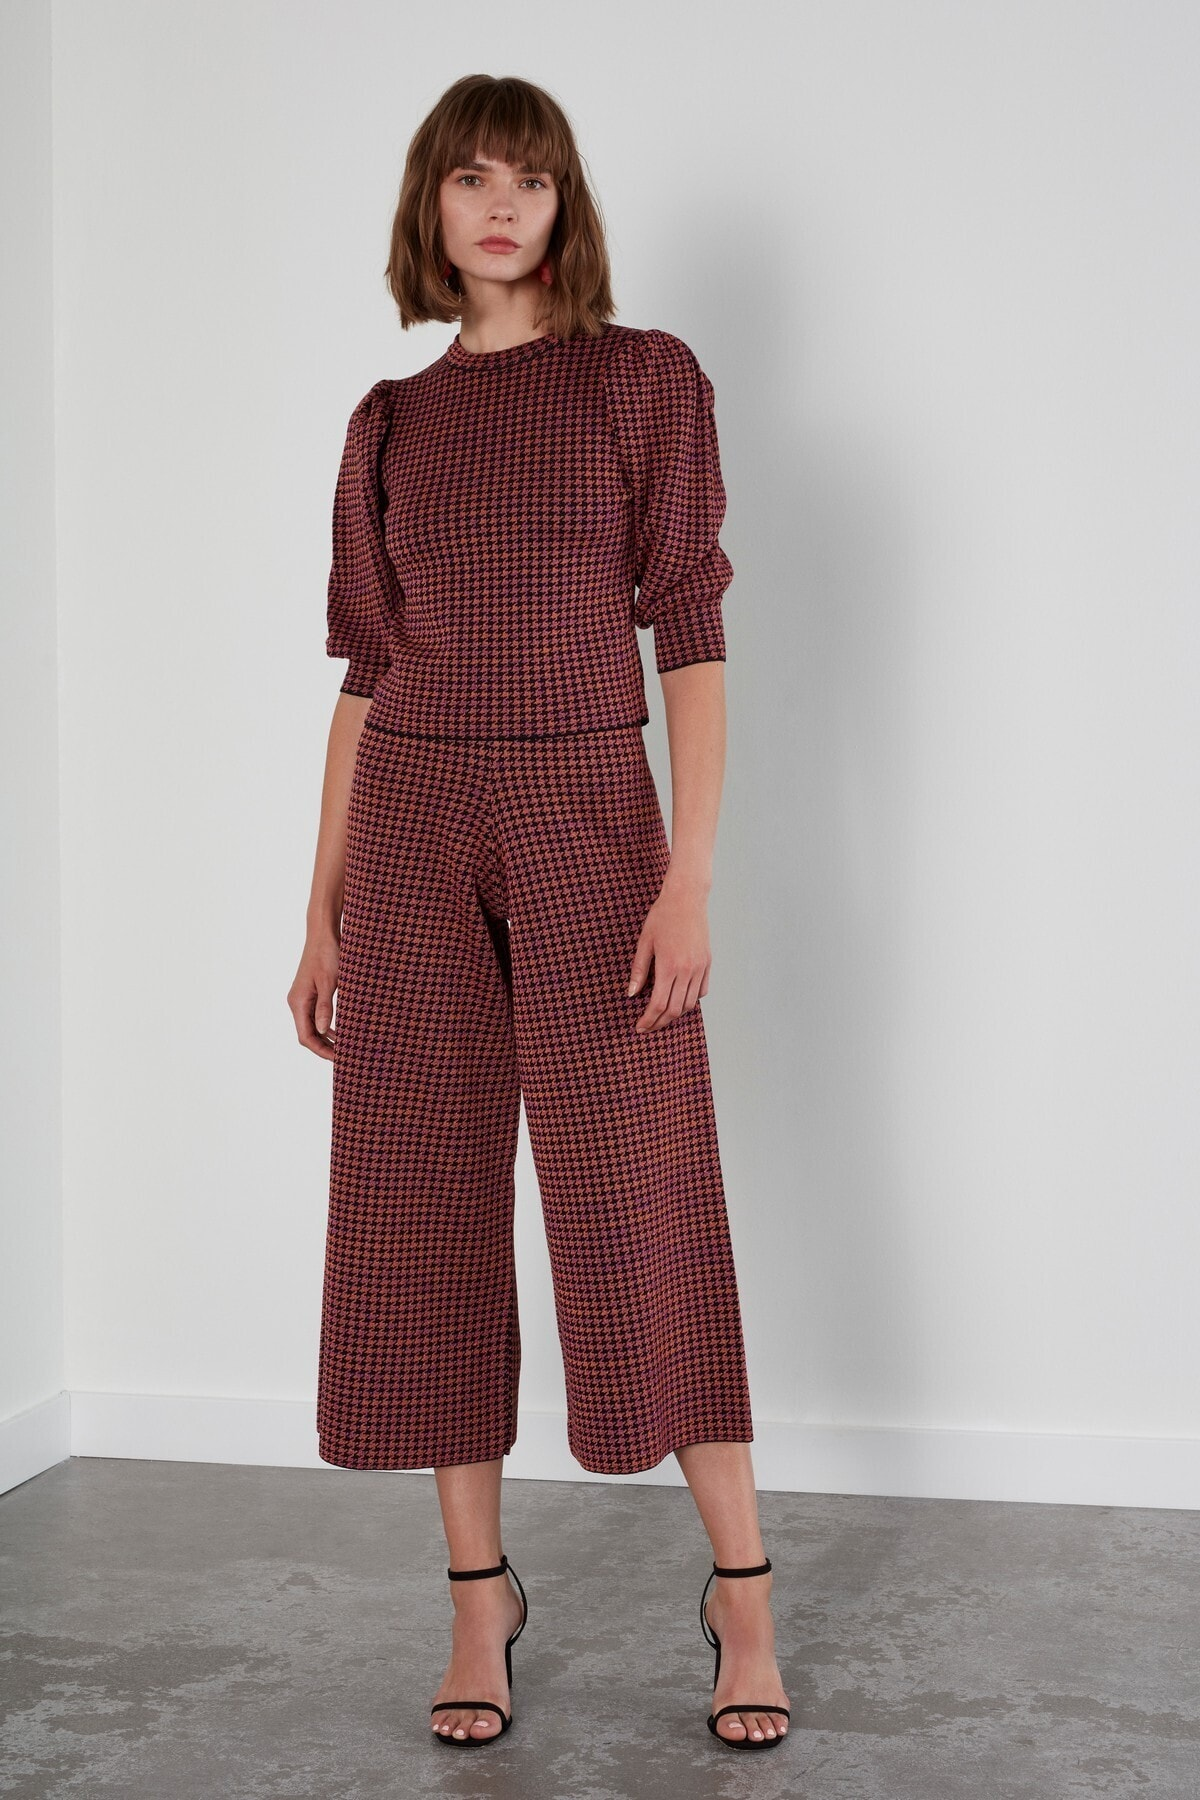 JOIN US Kadın Kahverengi Desenli Beli Lastikli Triko Pantolon 1